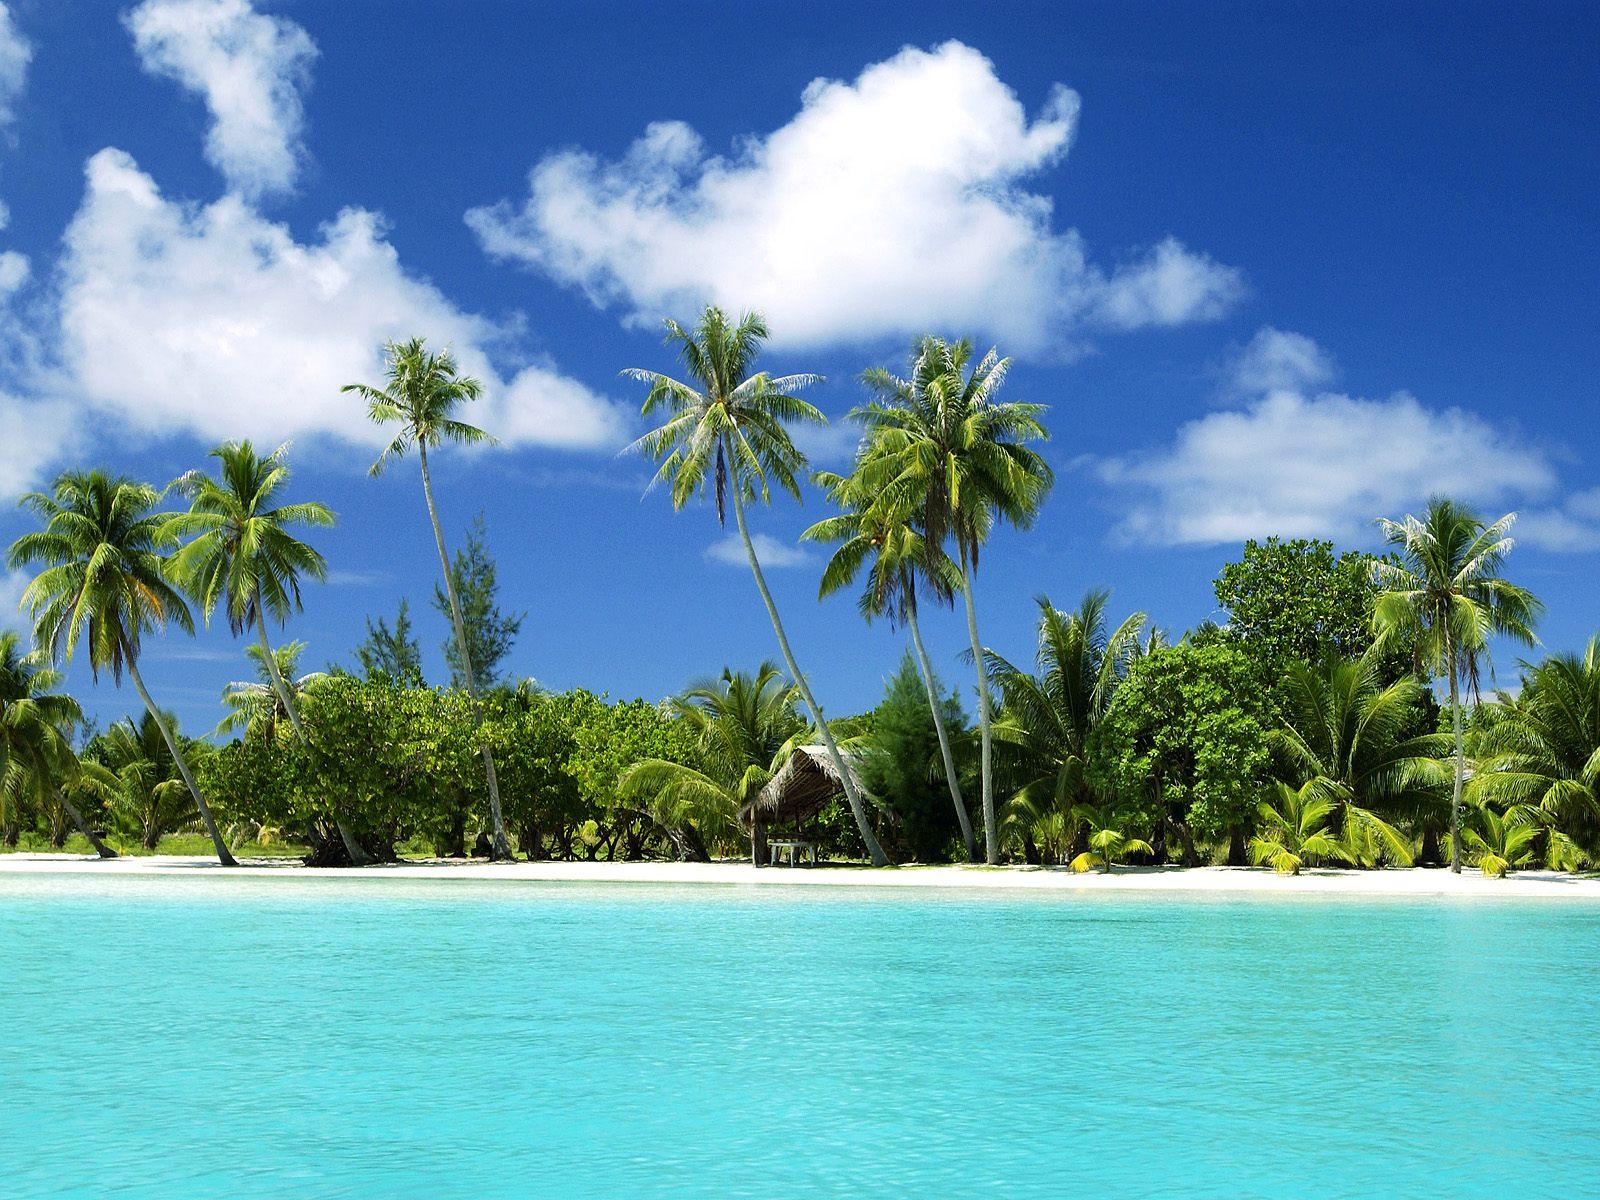 http://4.bp.blogspot.com/-AkHZRNzPpjo/ThMruZKpRLI/AAAAAAAAAF4/WP-zC7wfImI/s1600/beach49-scenery-wallpapers.jpg